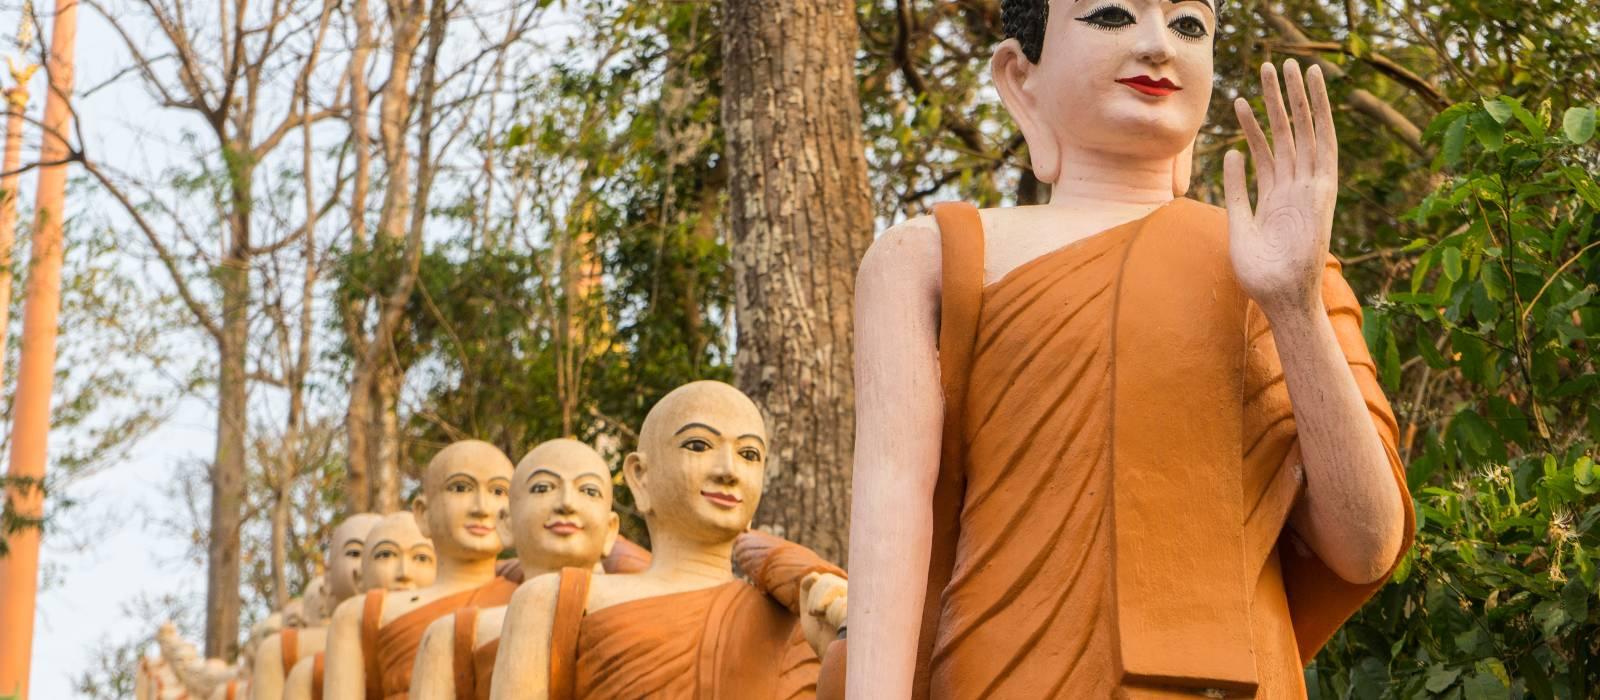 Das kulturelle Erbe Kambodschas Urlaub 1